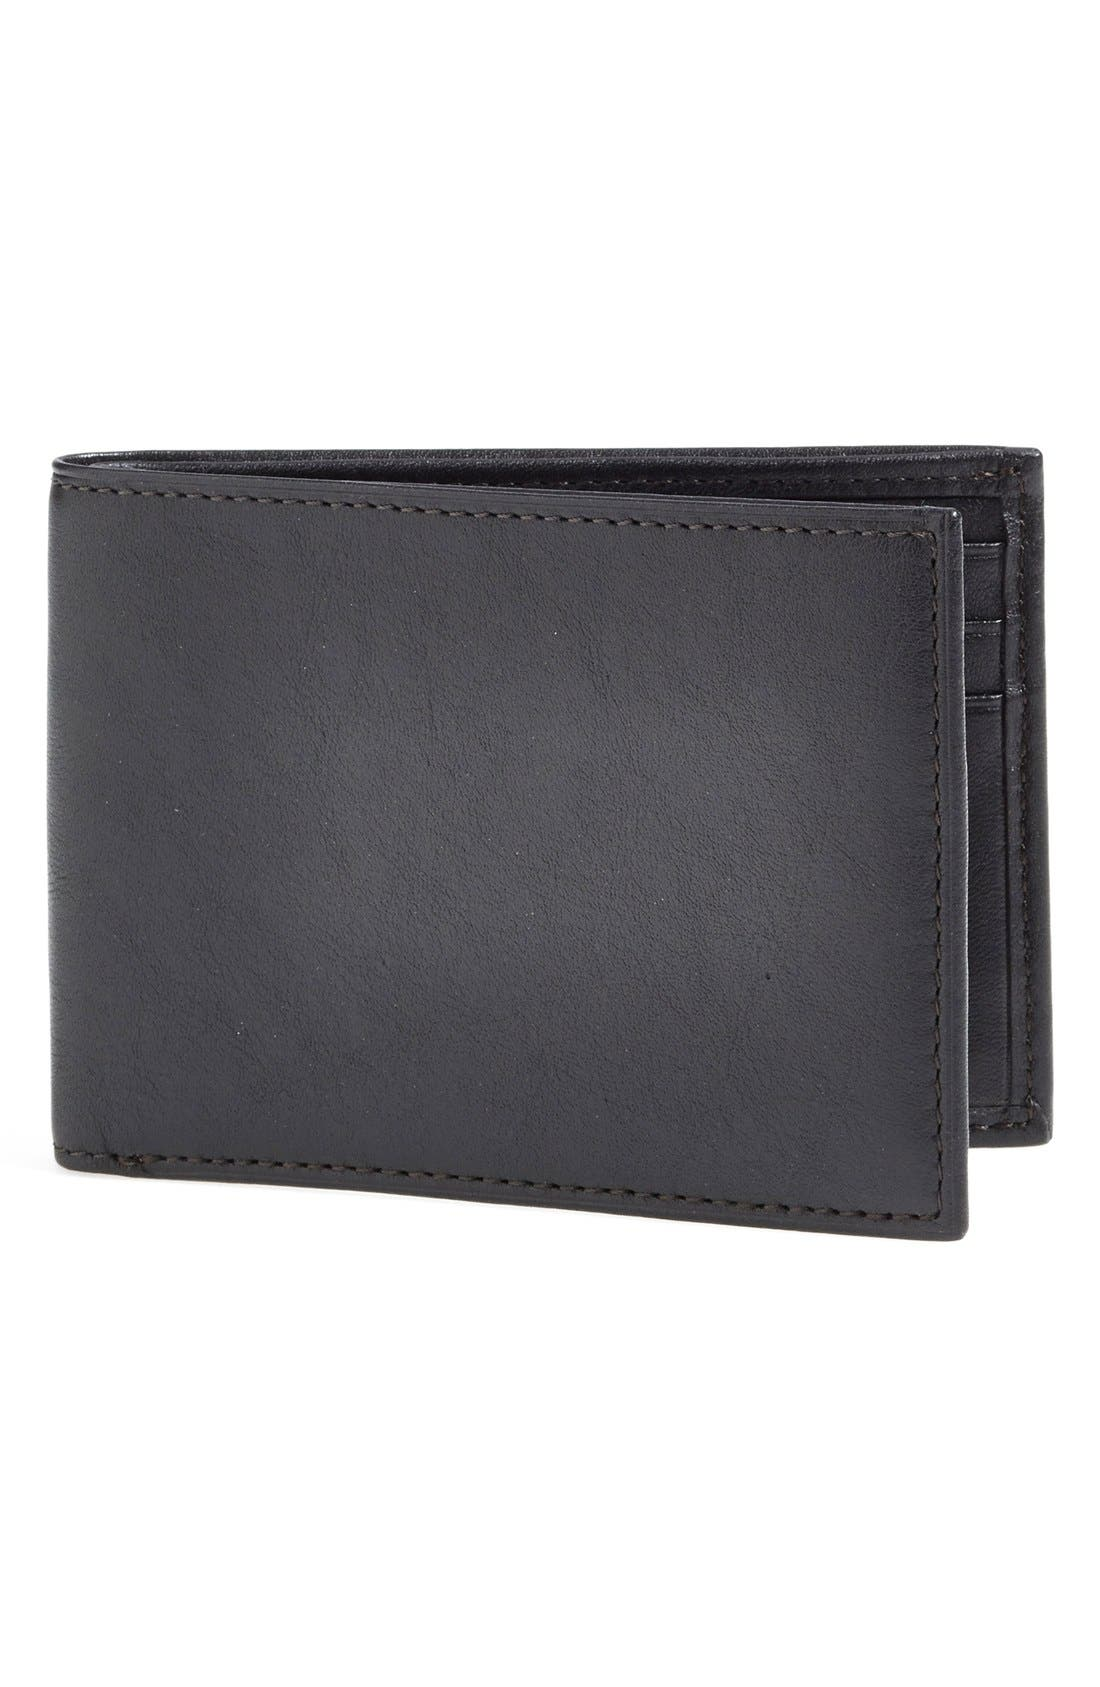 Main Image - Bosca Small Bifold Wallet